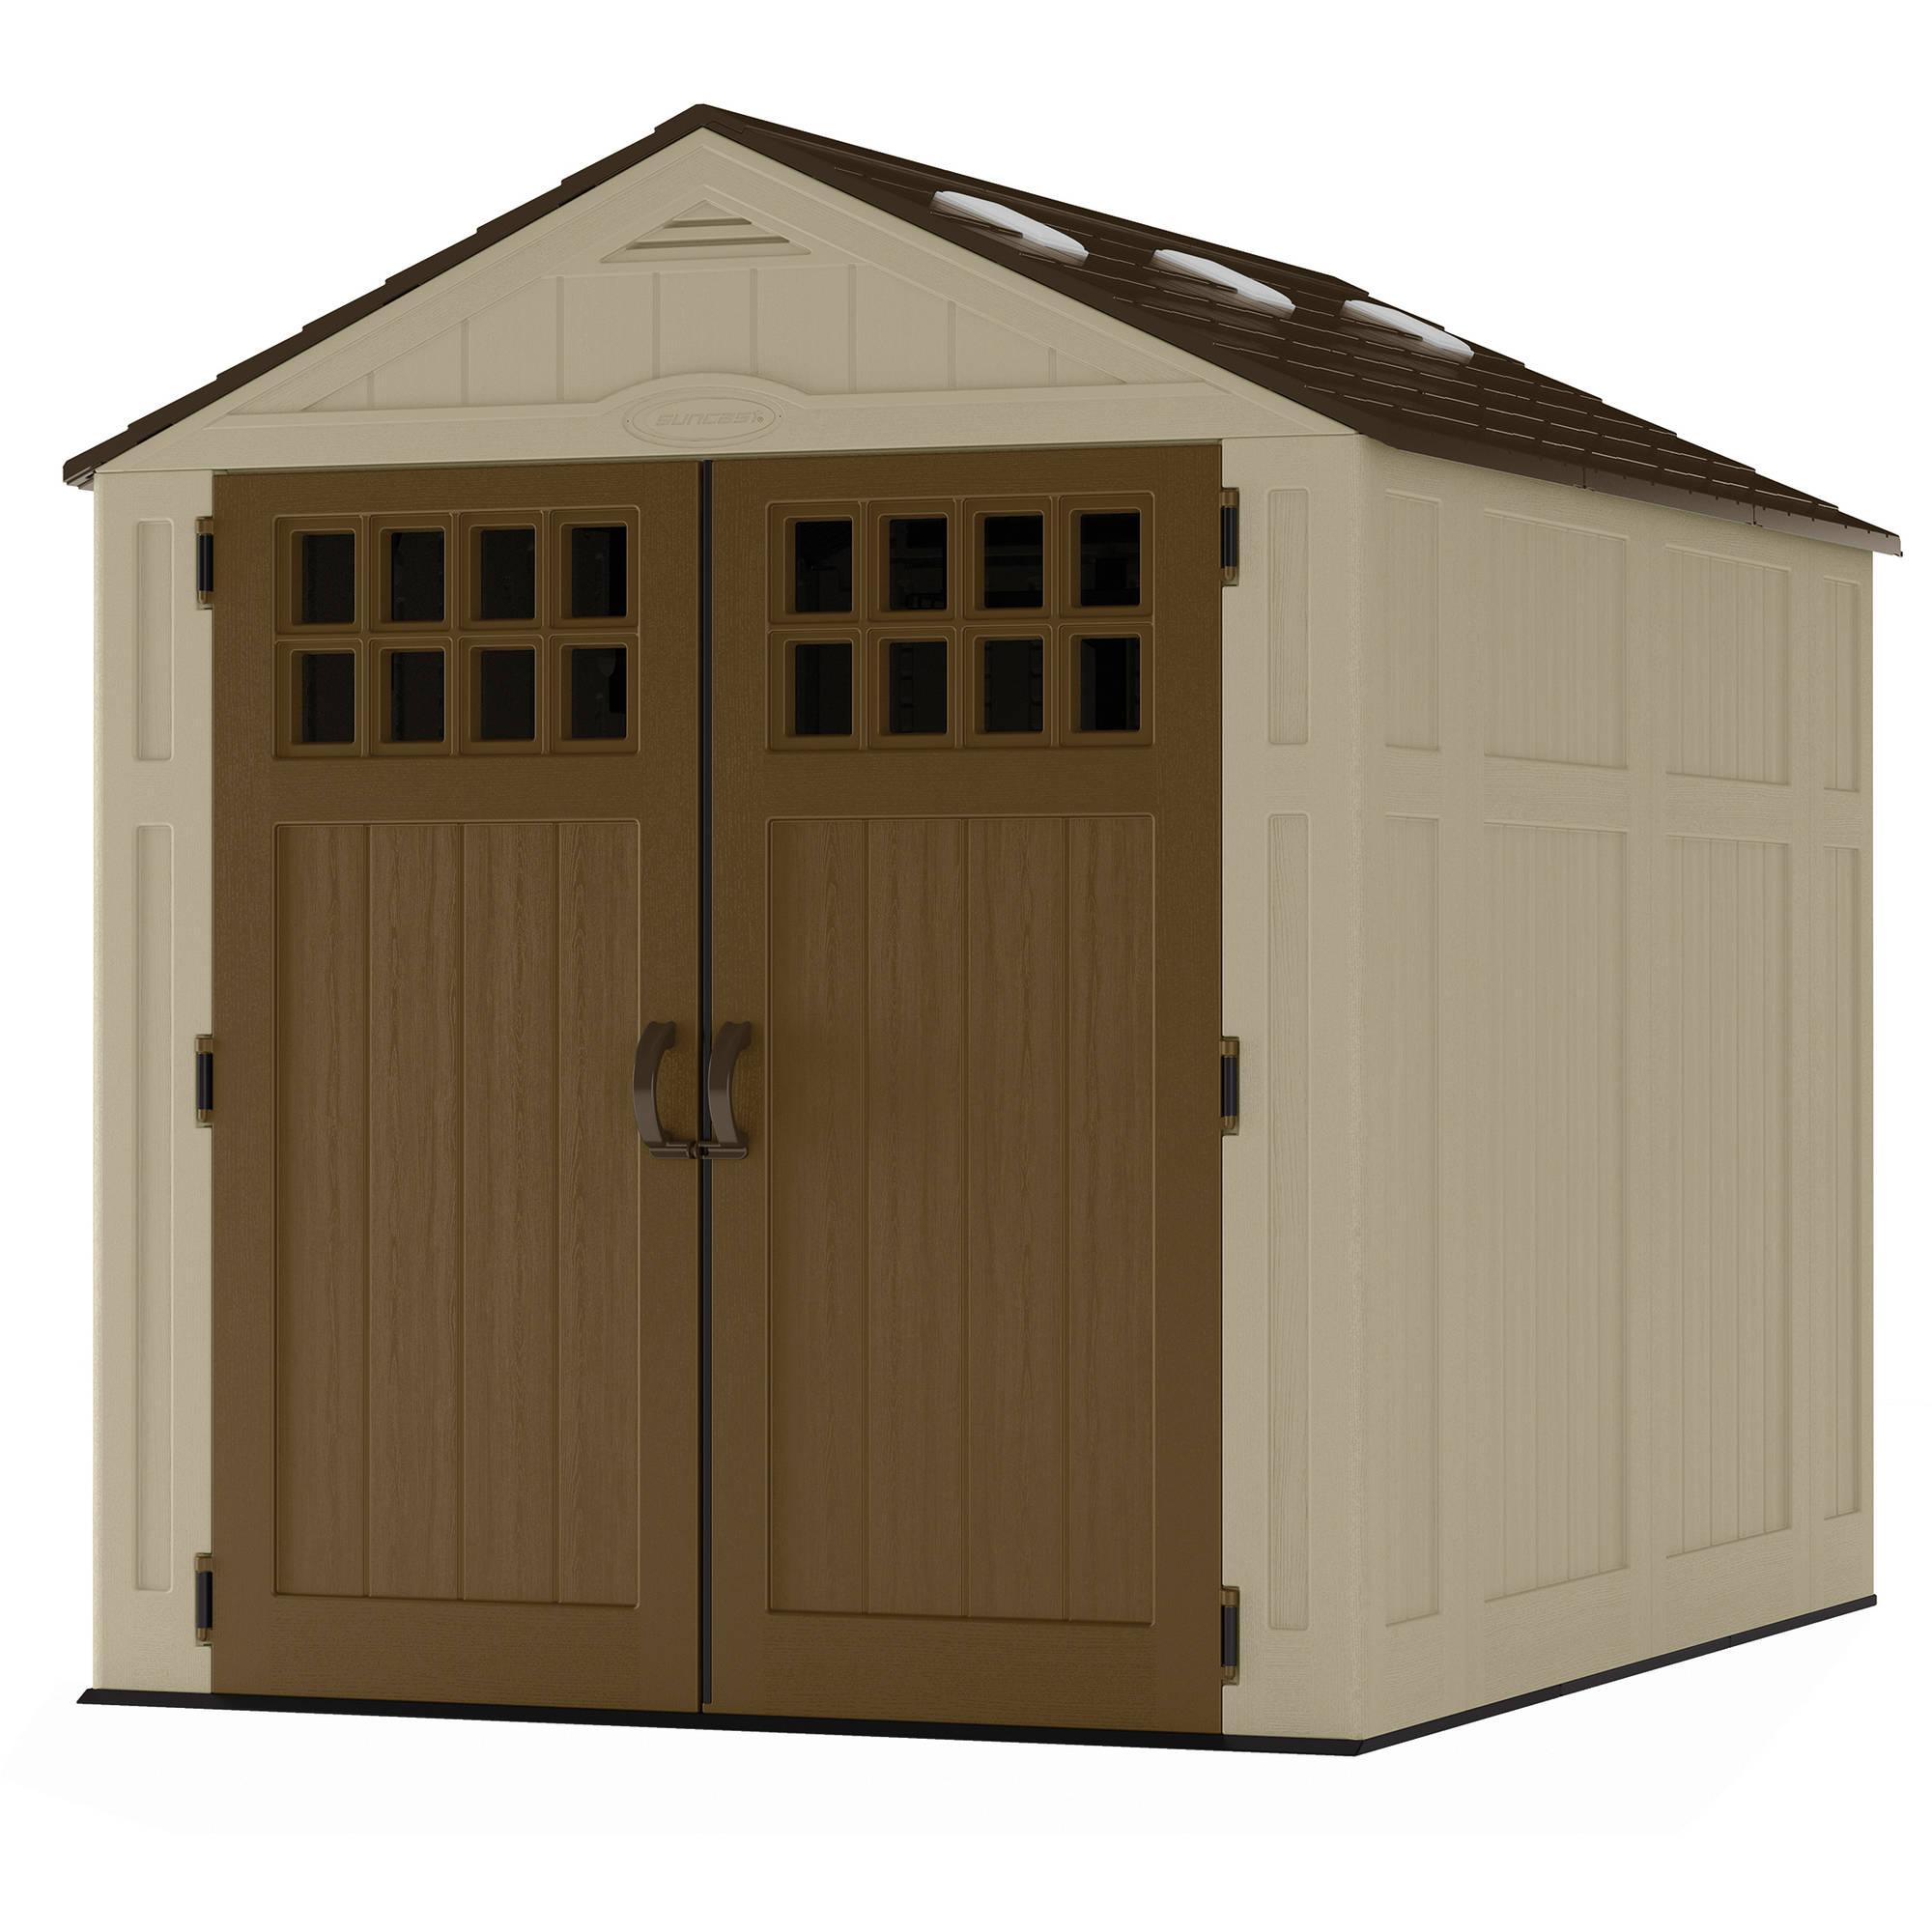 outdoor sheds sheds UQZMDEU